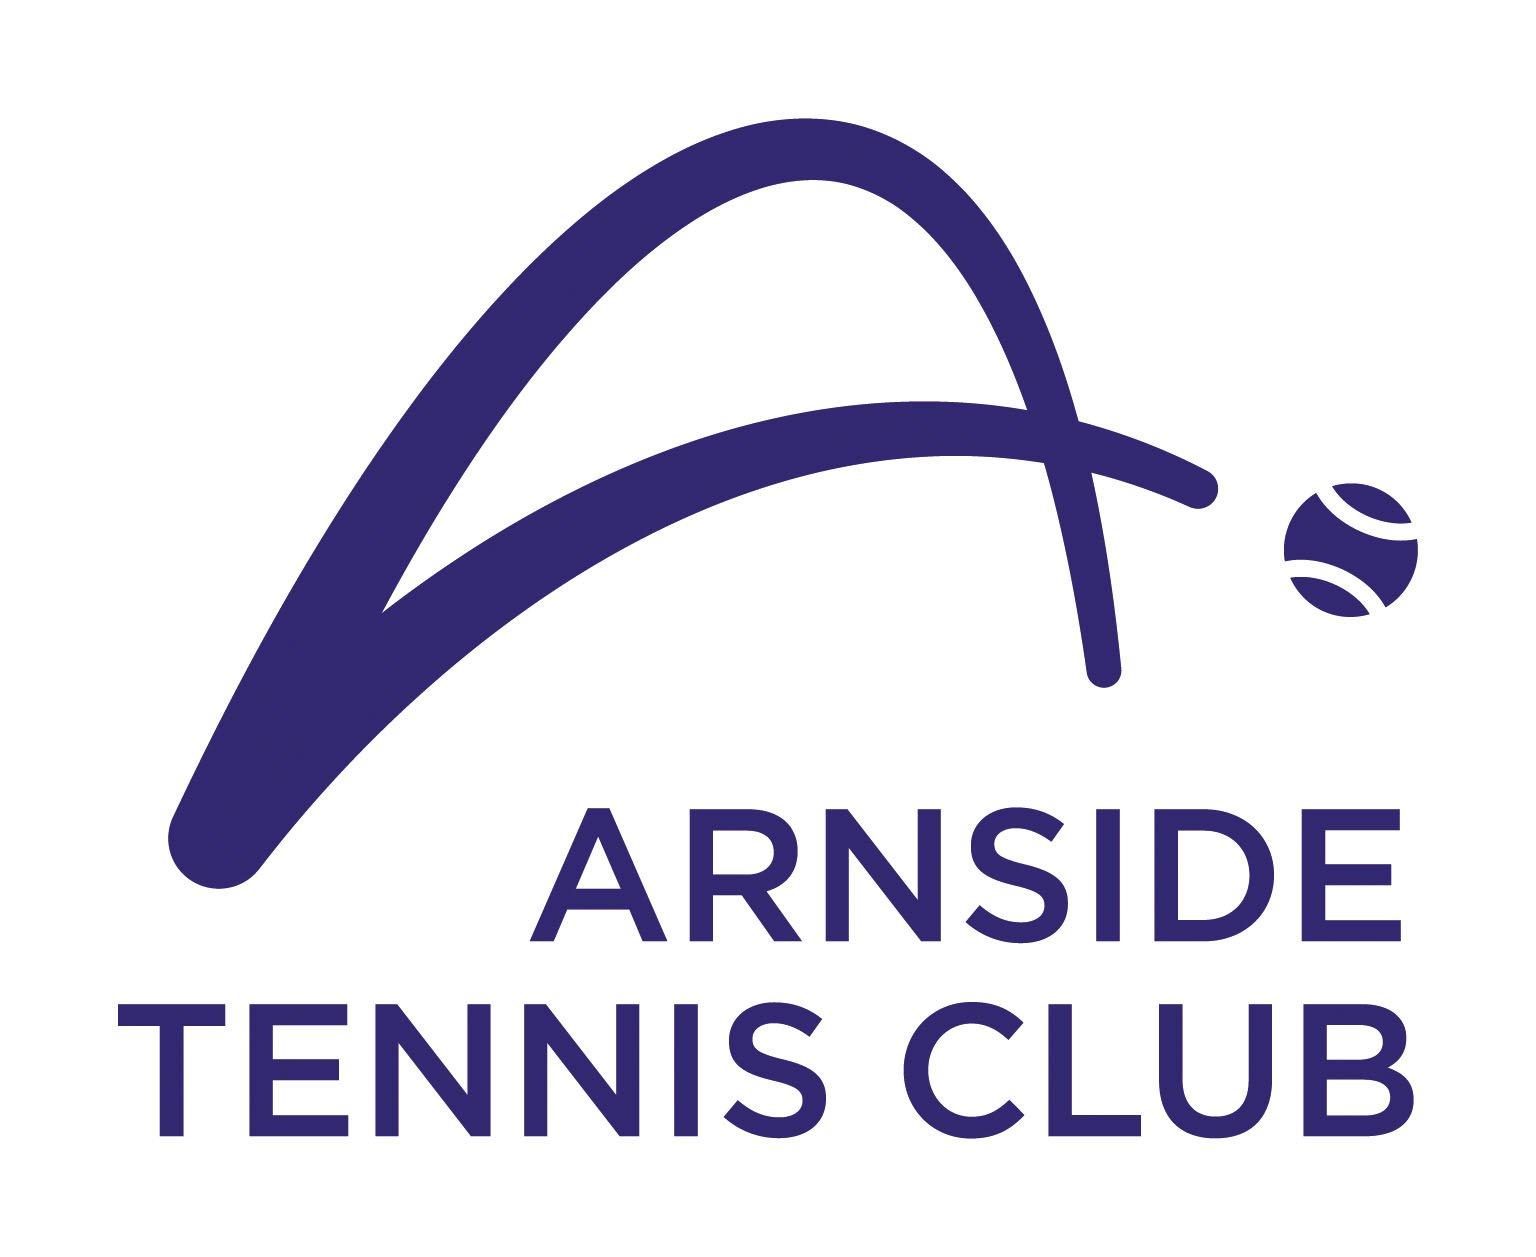 Arnside Tennis Club